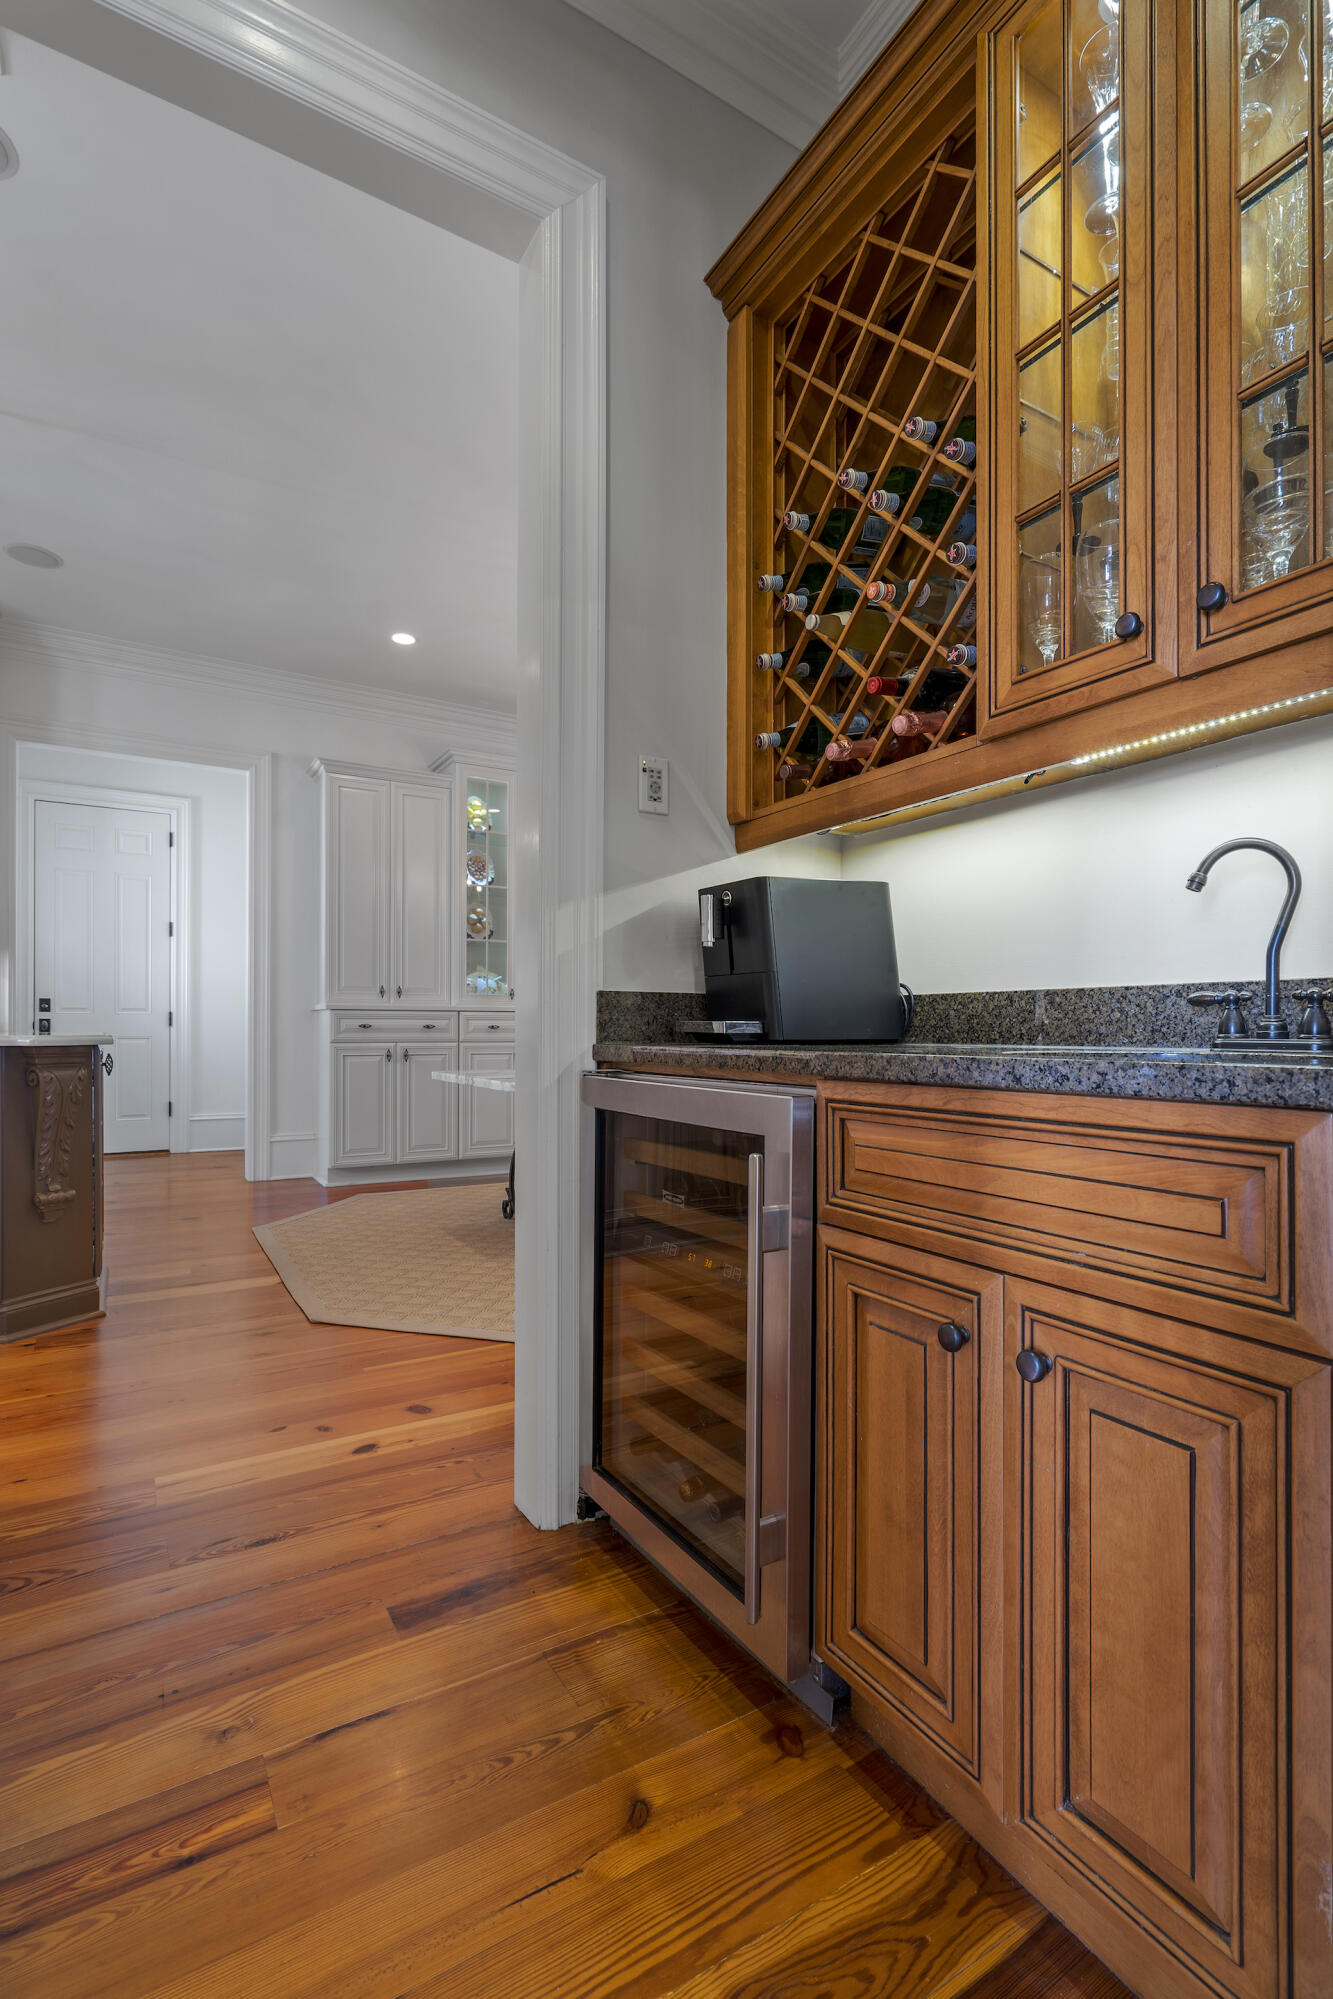 Daniel Island Homes For Sale - 623 Island Park, Charleston, SC - 39